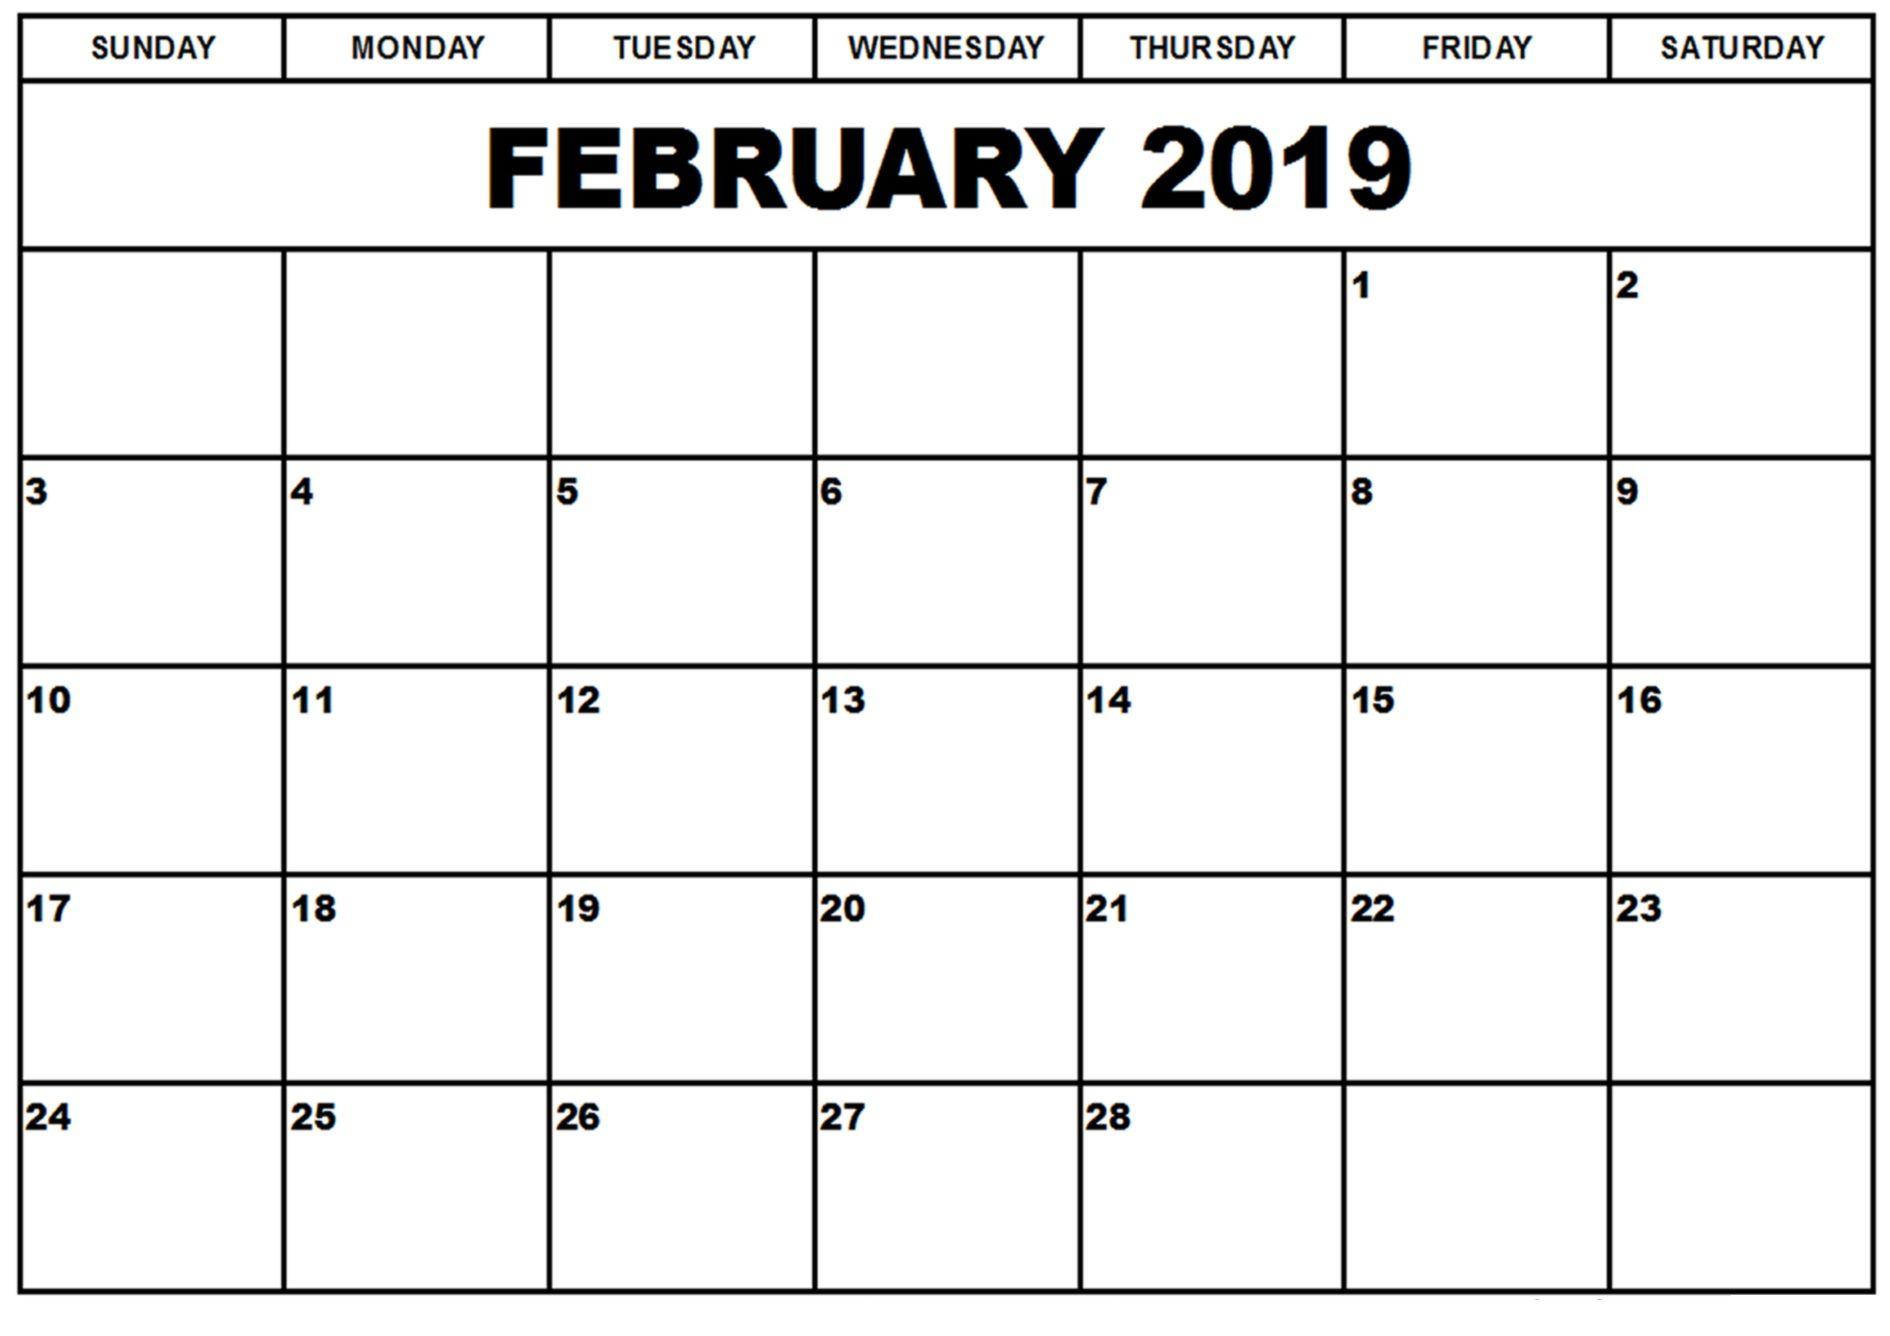 February 2019 Calendar to Print